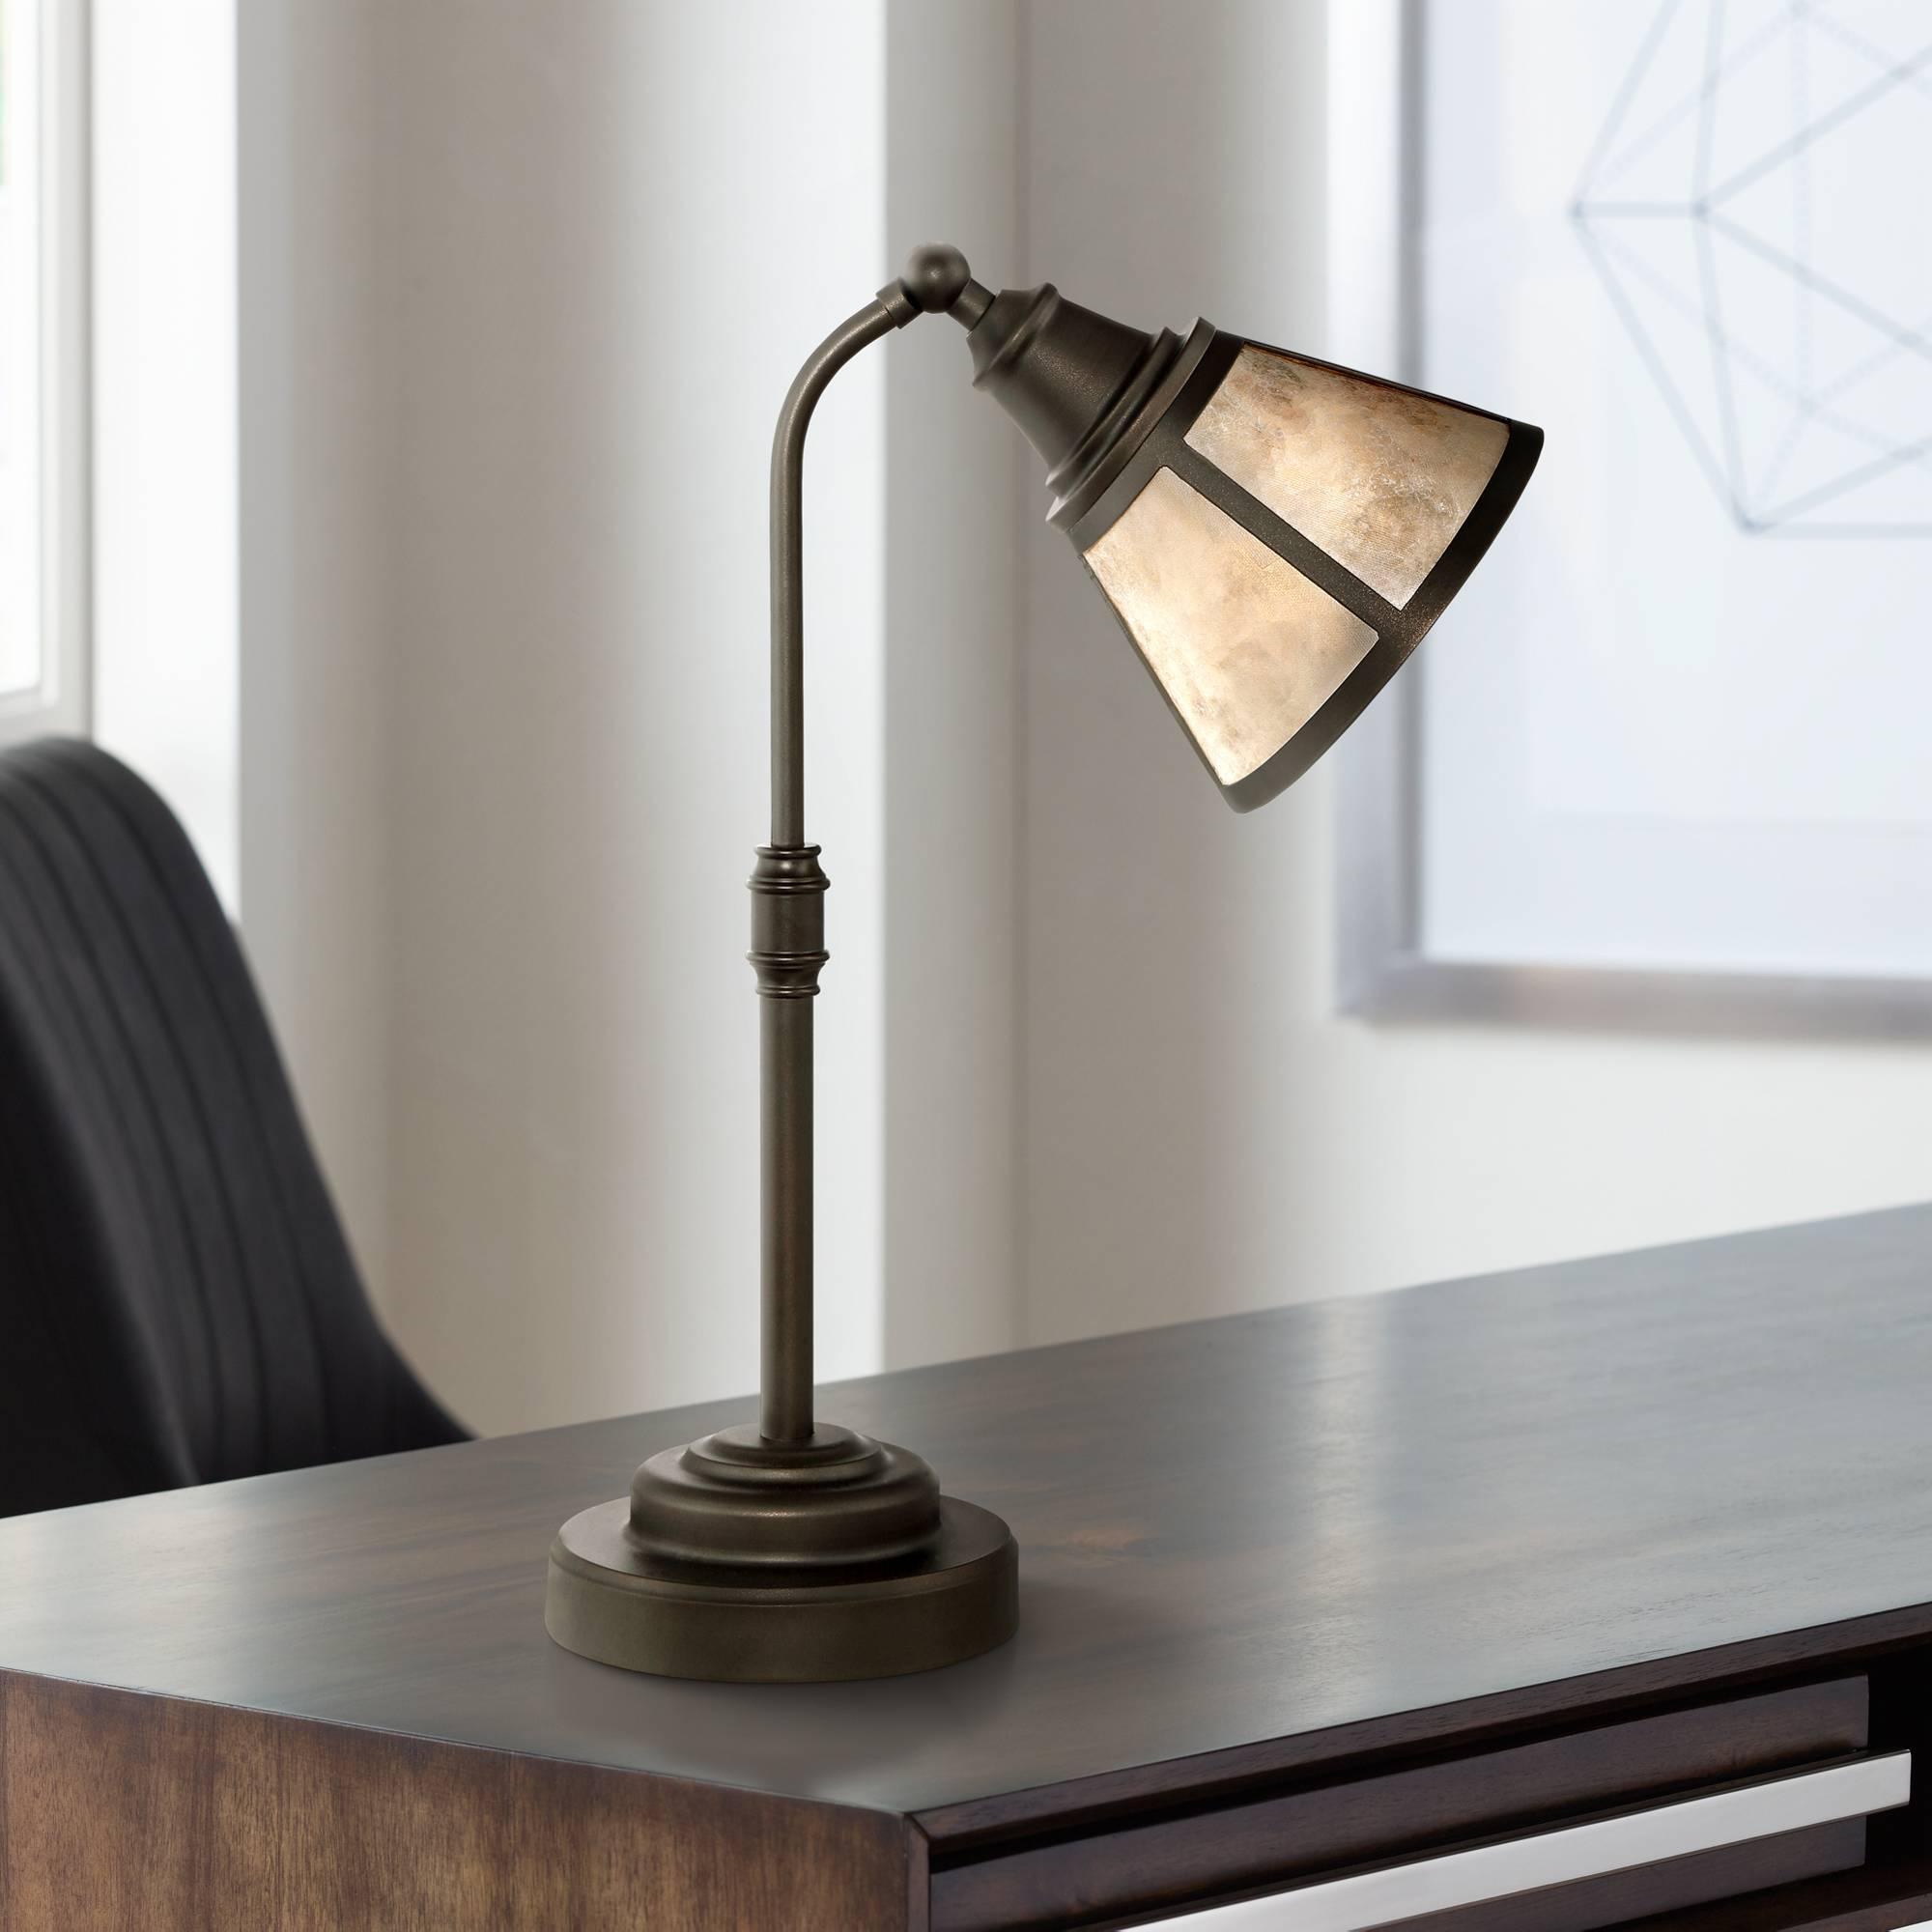 Farmhouse Desk Lamp Satin Bronze Blond Mica Shade For Living Room Bedroom Office 736101843283 Ebay